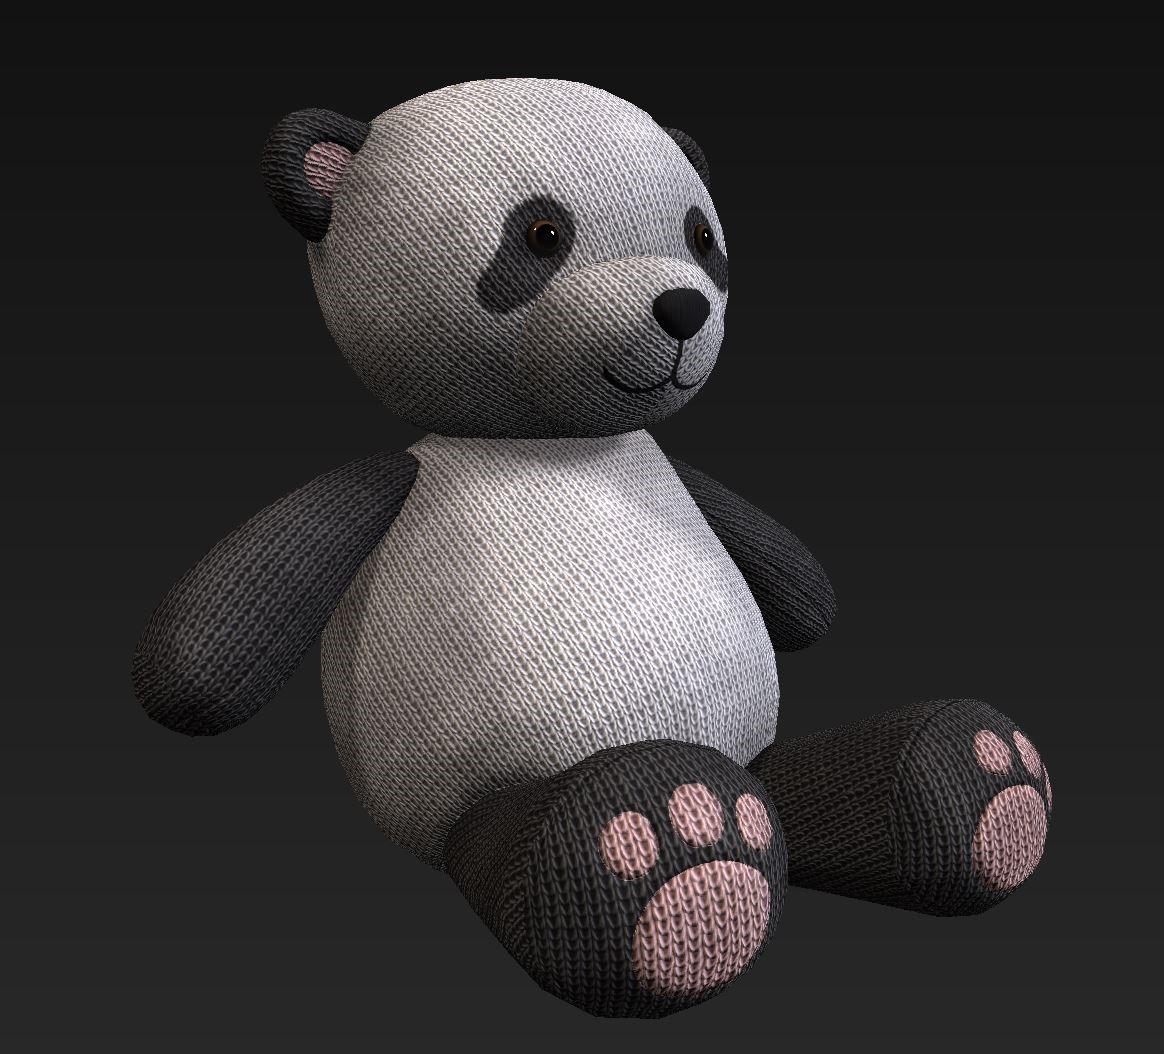 TeddyBear_58.JPG